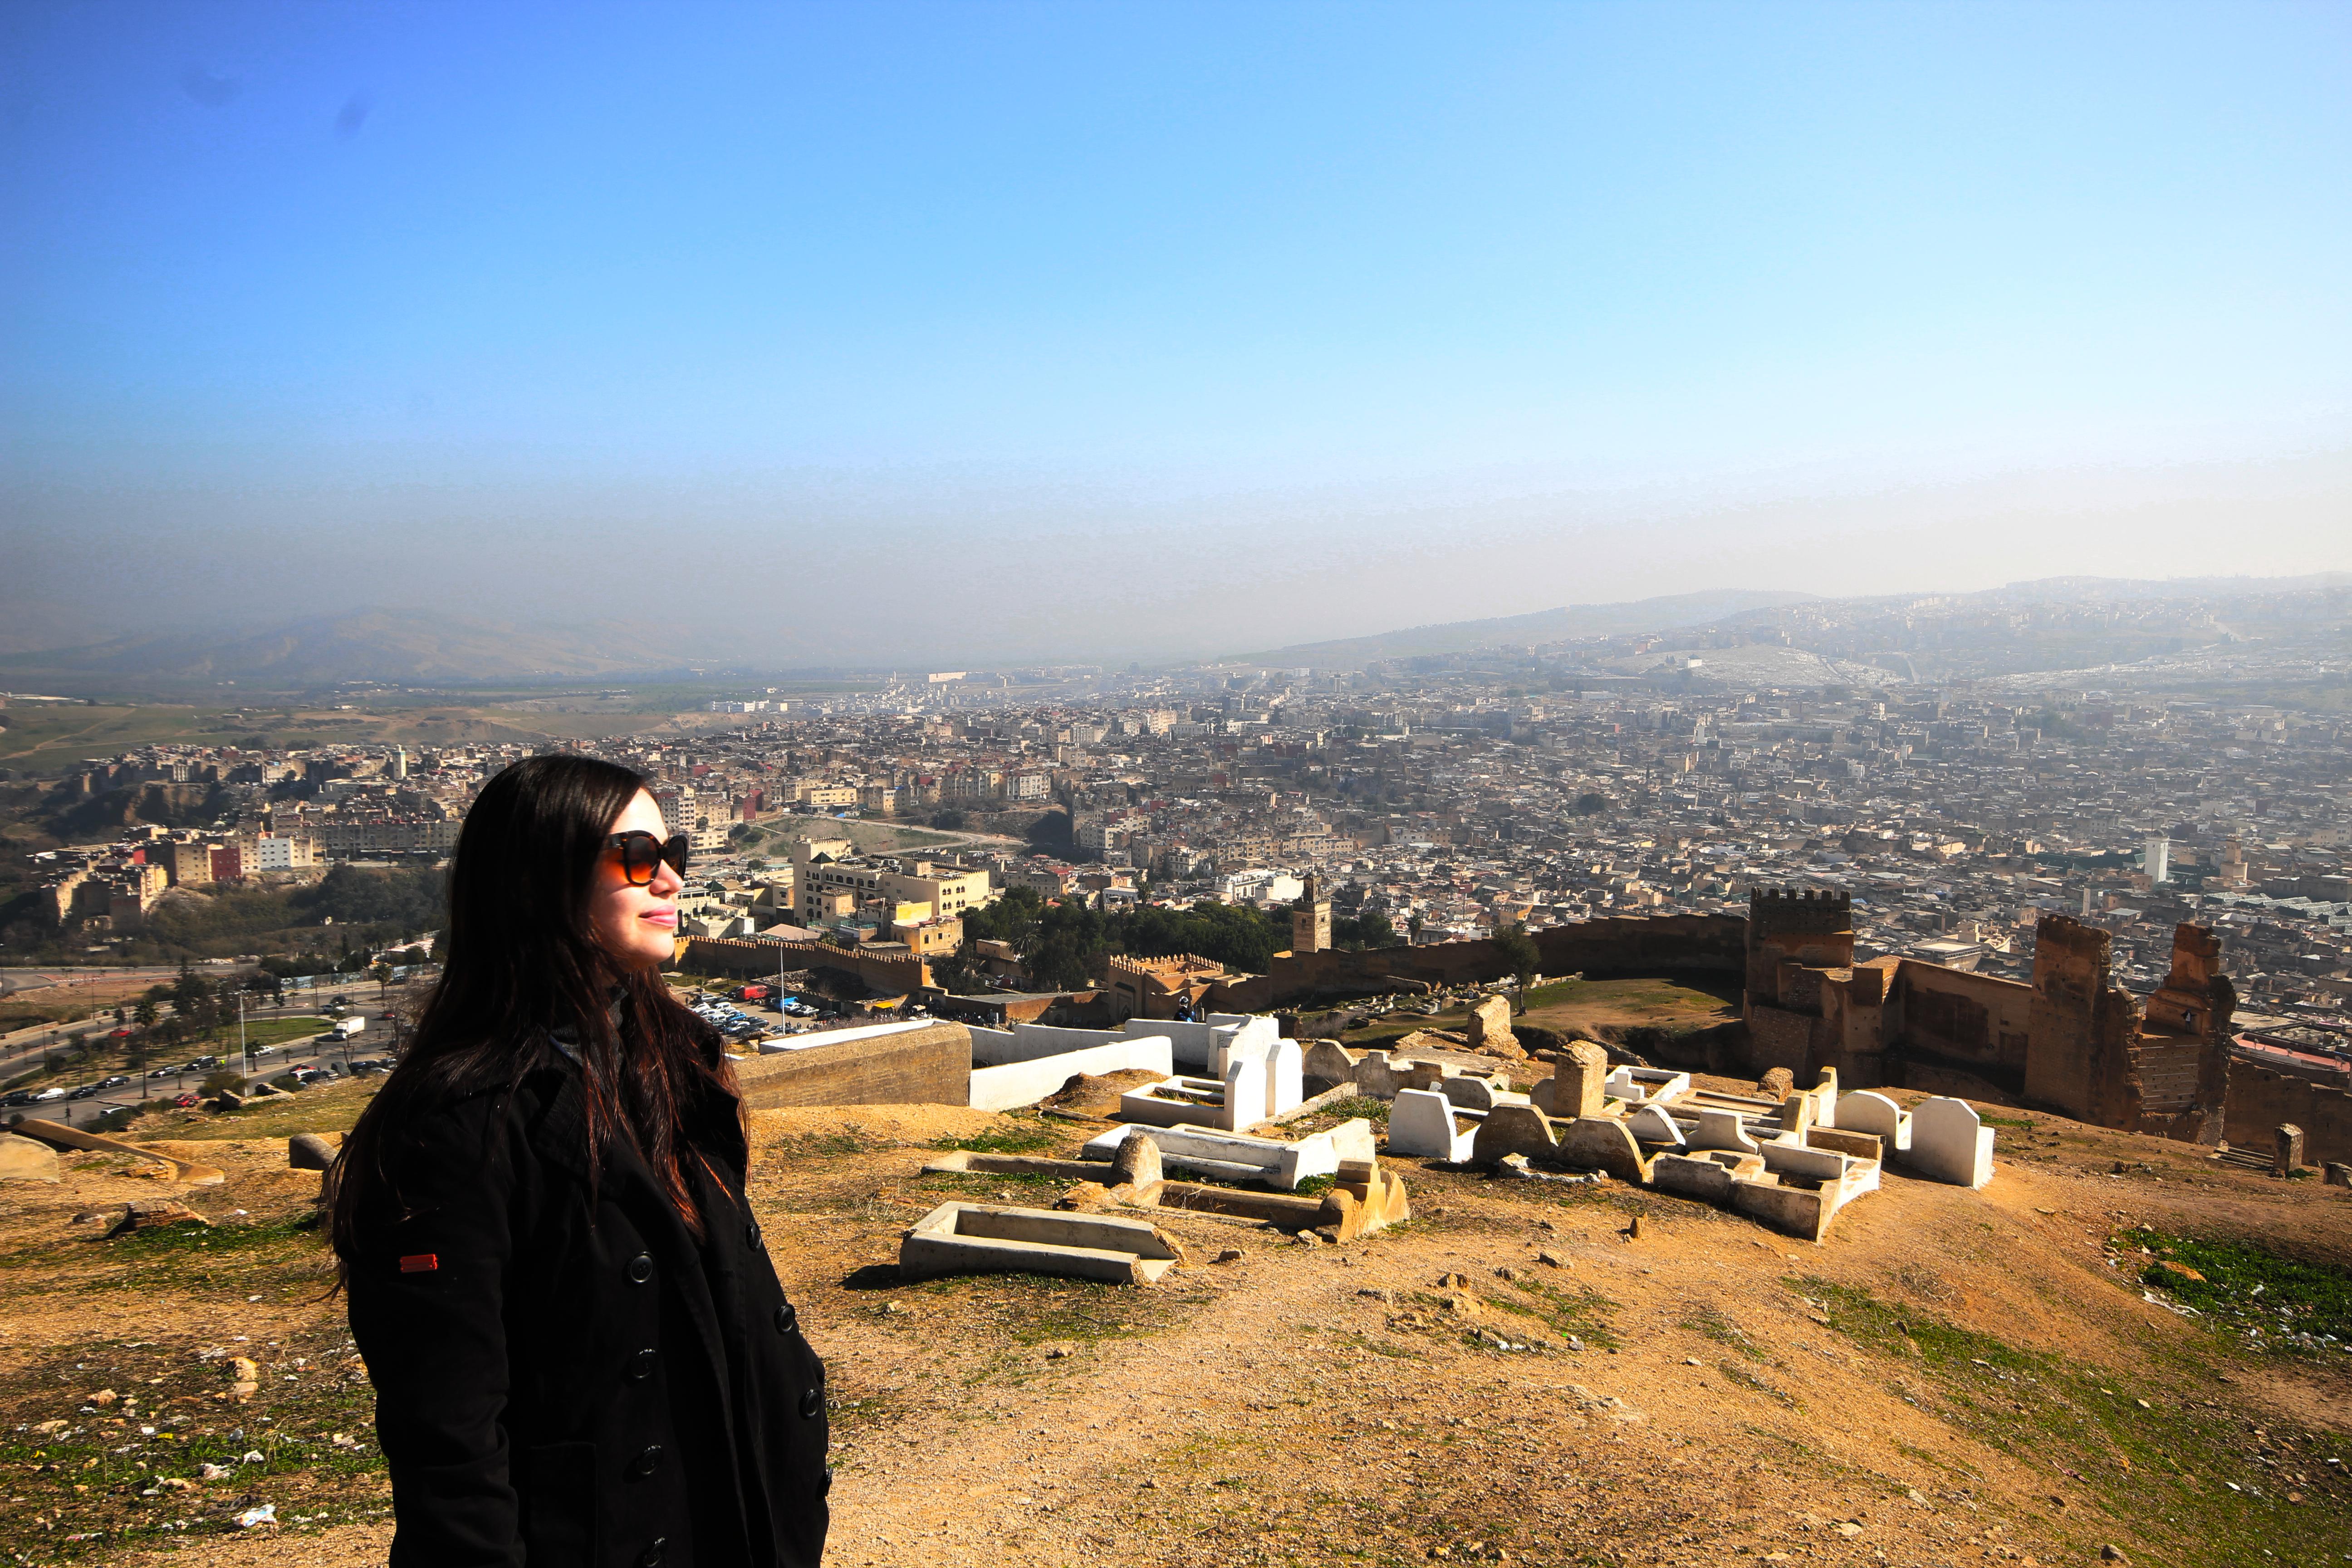 nao-e-caro-viajar-marrocos-fes-.png